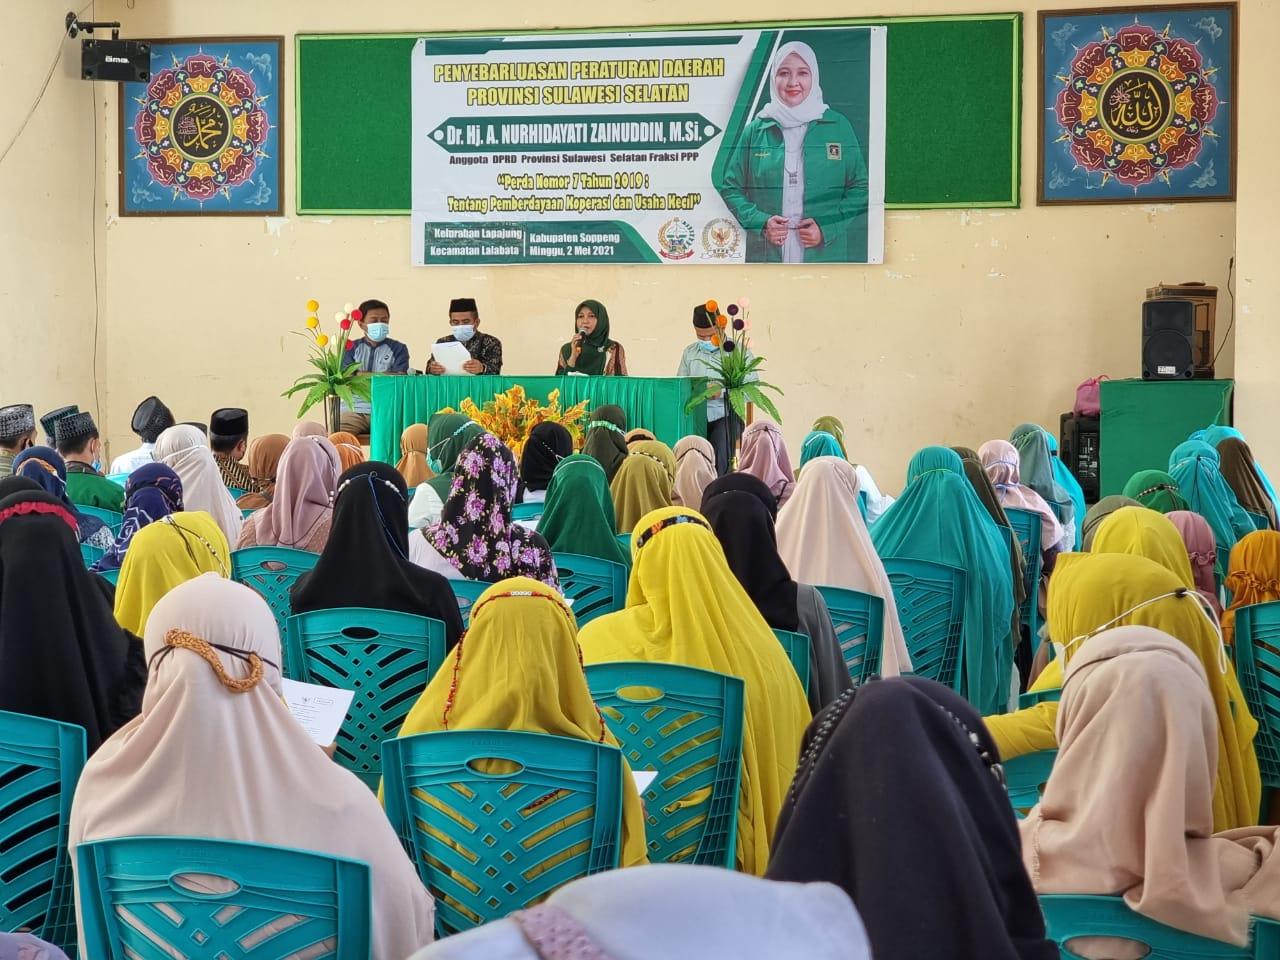 Dihadapan Ratusan Warga Nahdliyin, Andi Nurhidayati Tegaskan Komitmen Support Program NU Soppeng